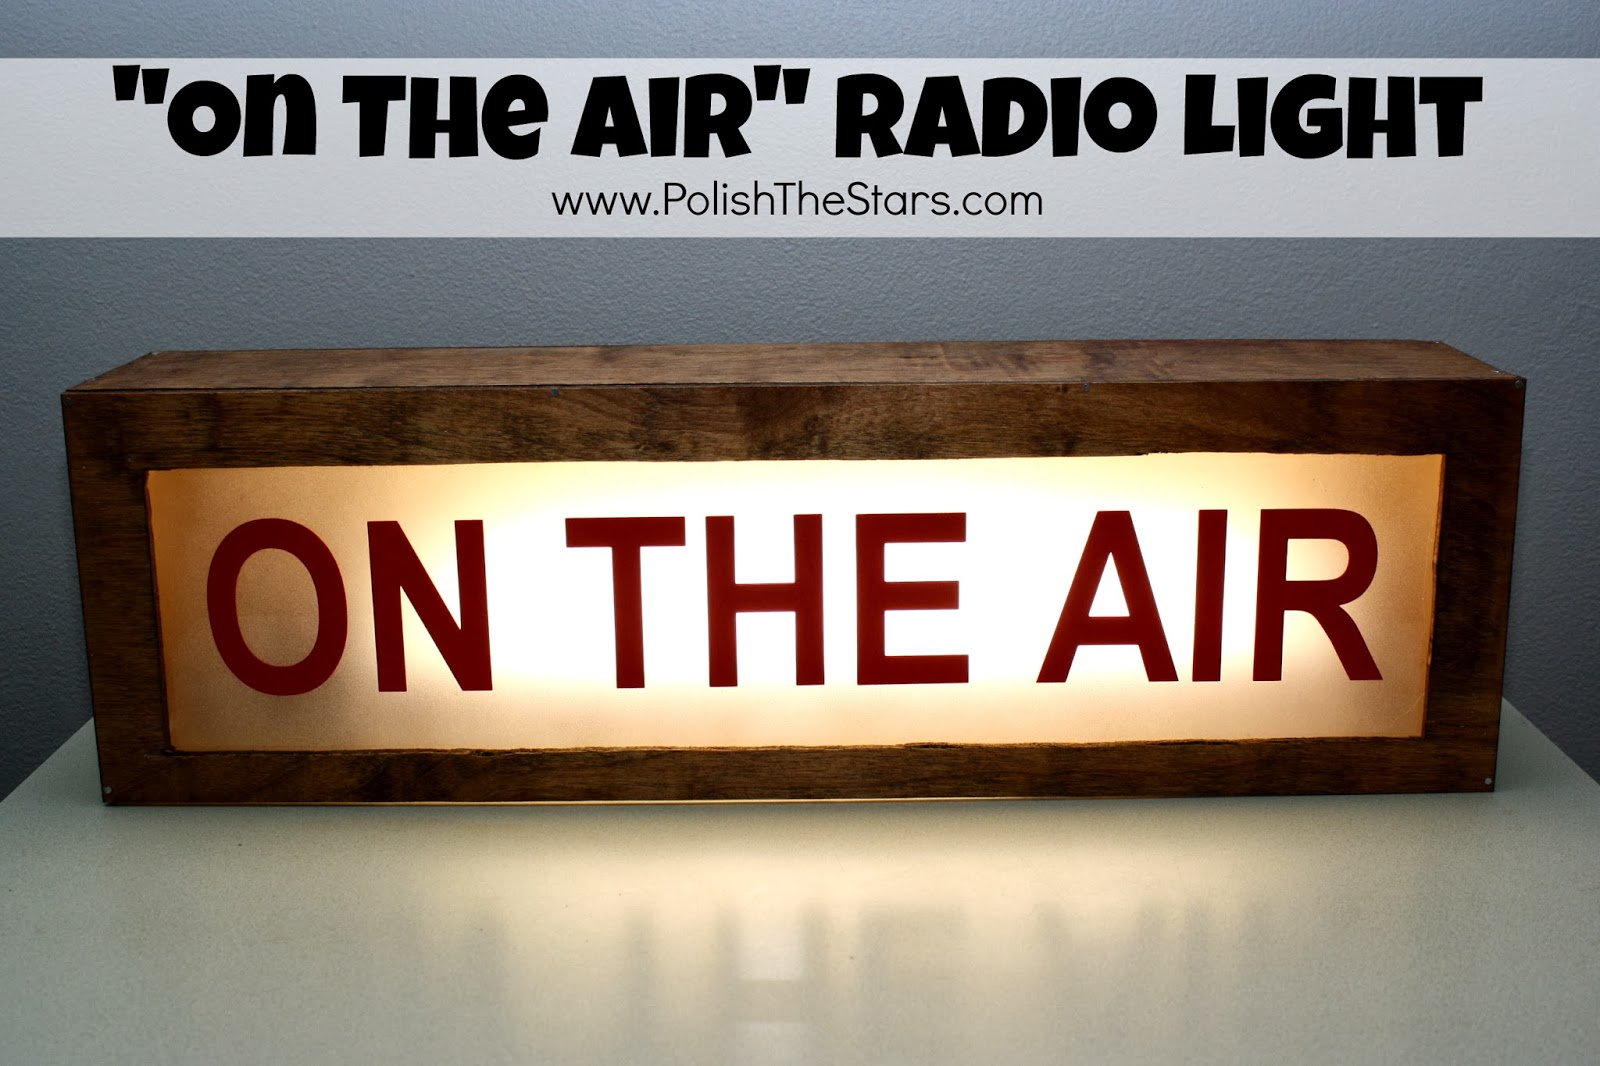 on the air light 1